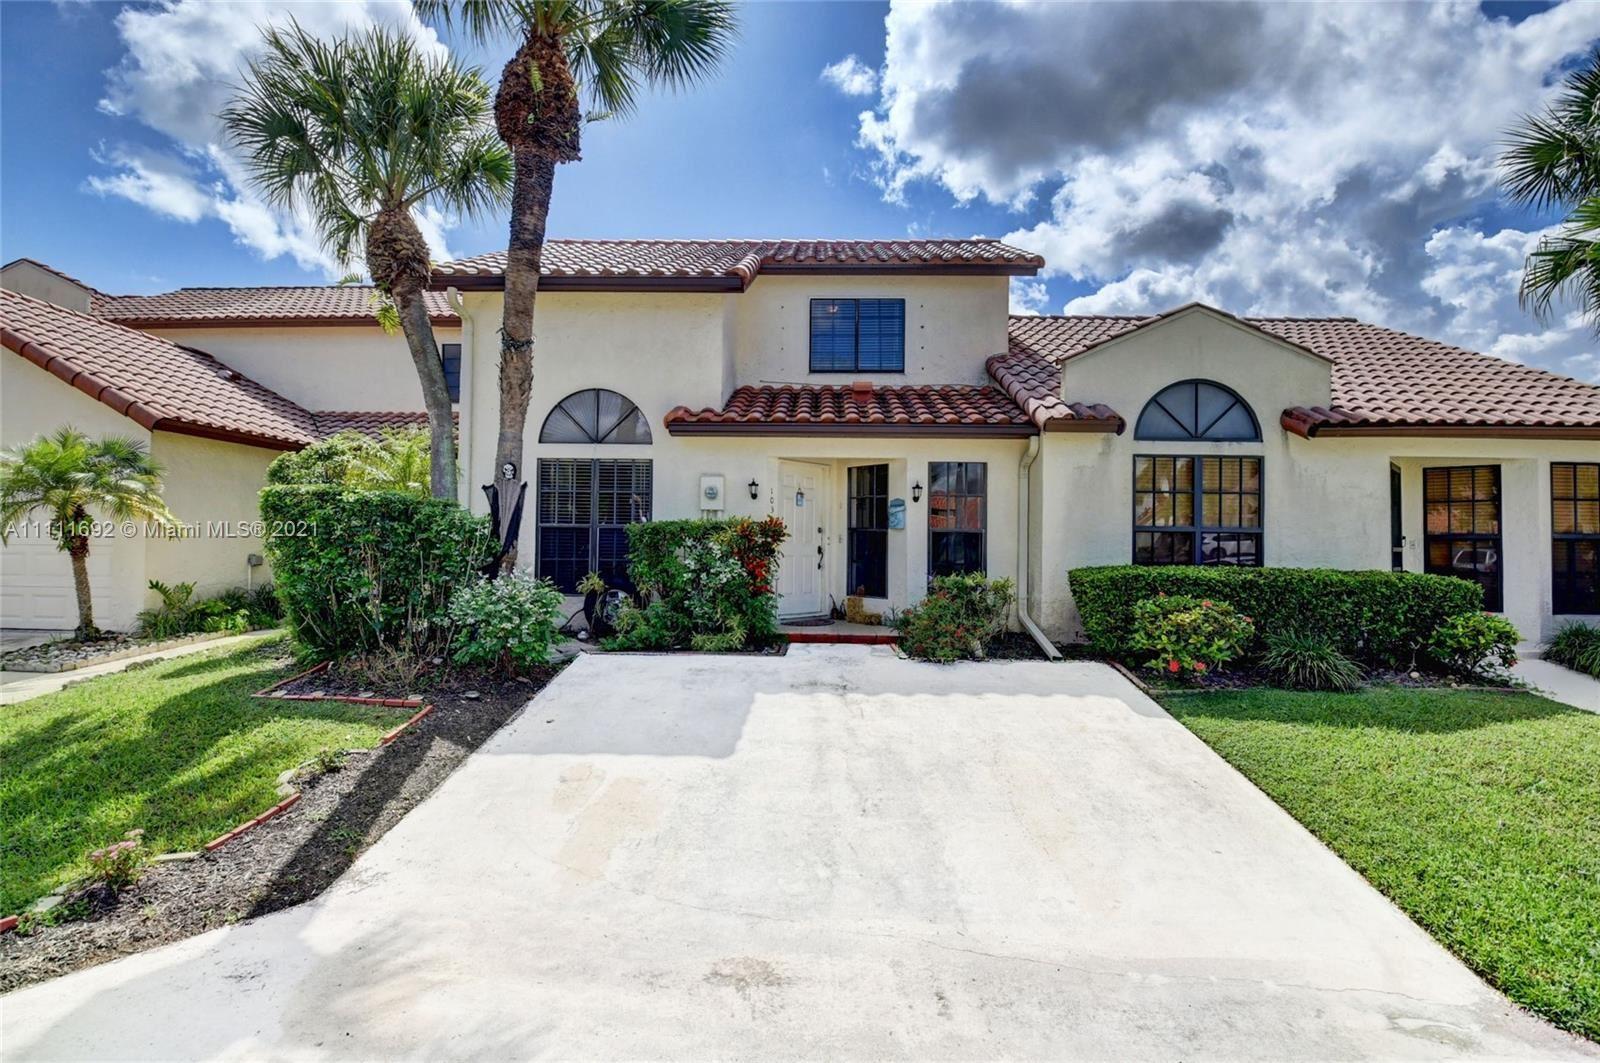 10300 W Hidden Springs Ct #10300, Boca Raton, FL 33498 - #: A11111692